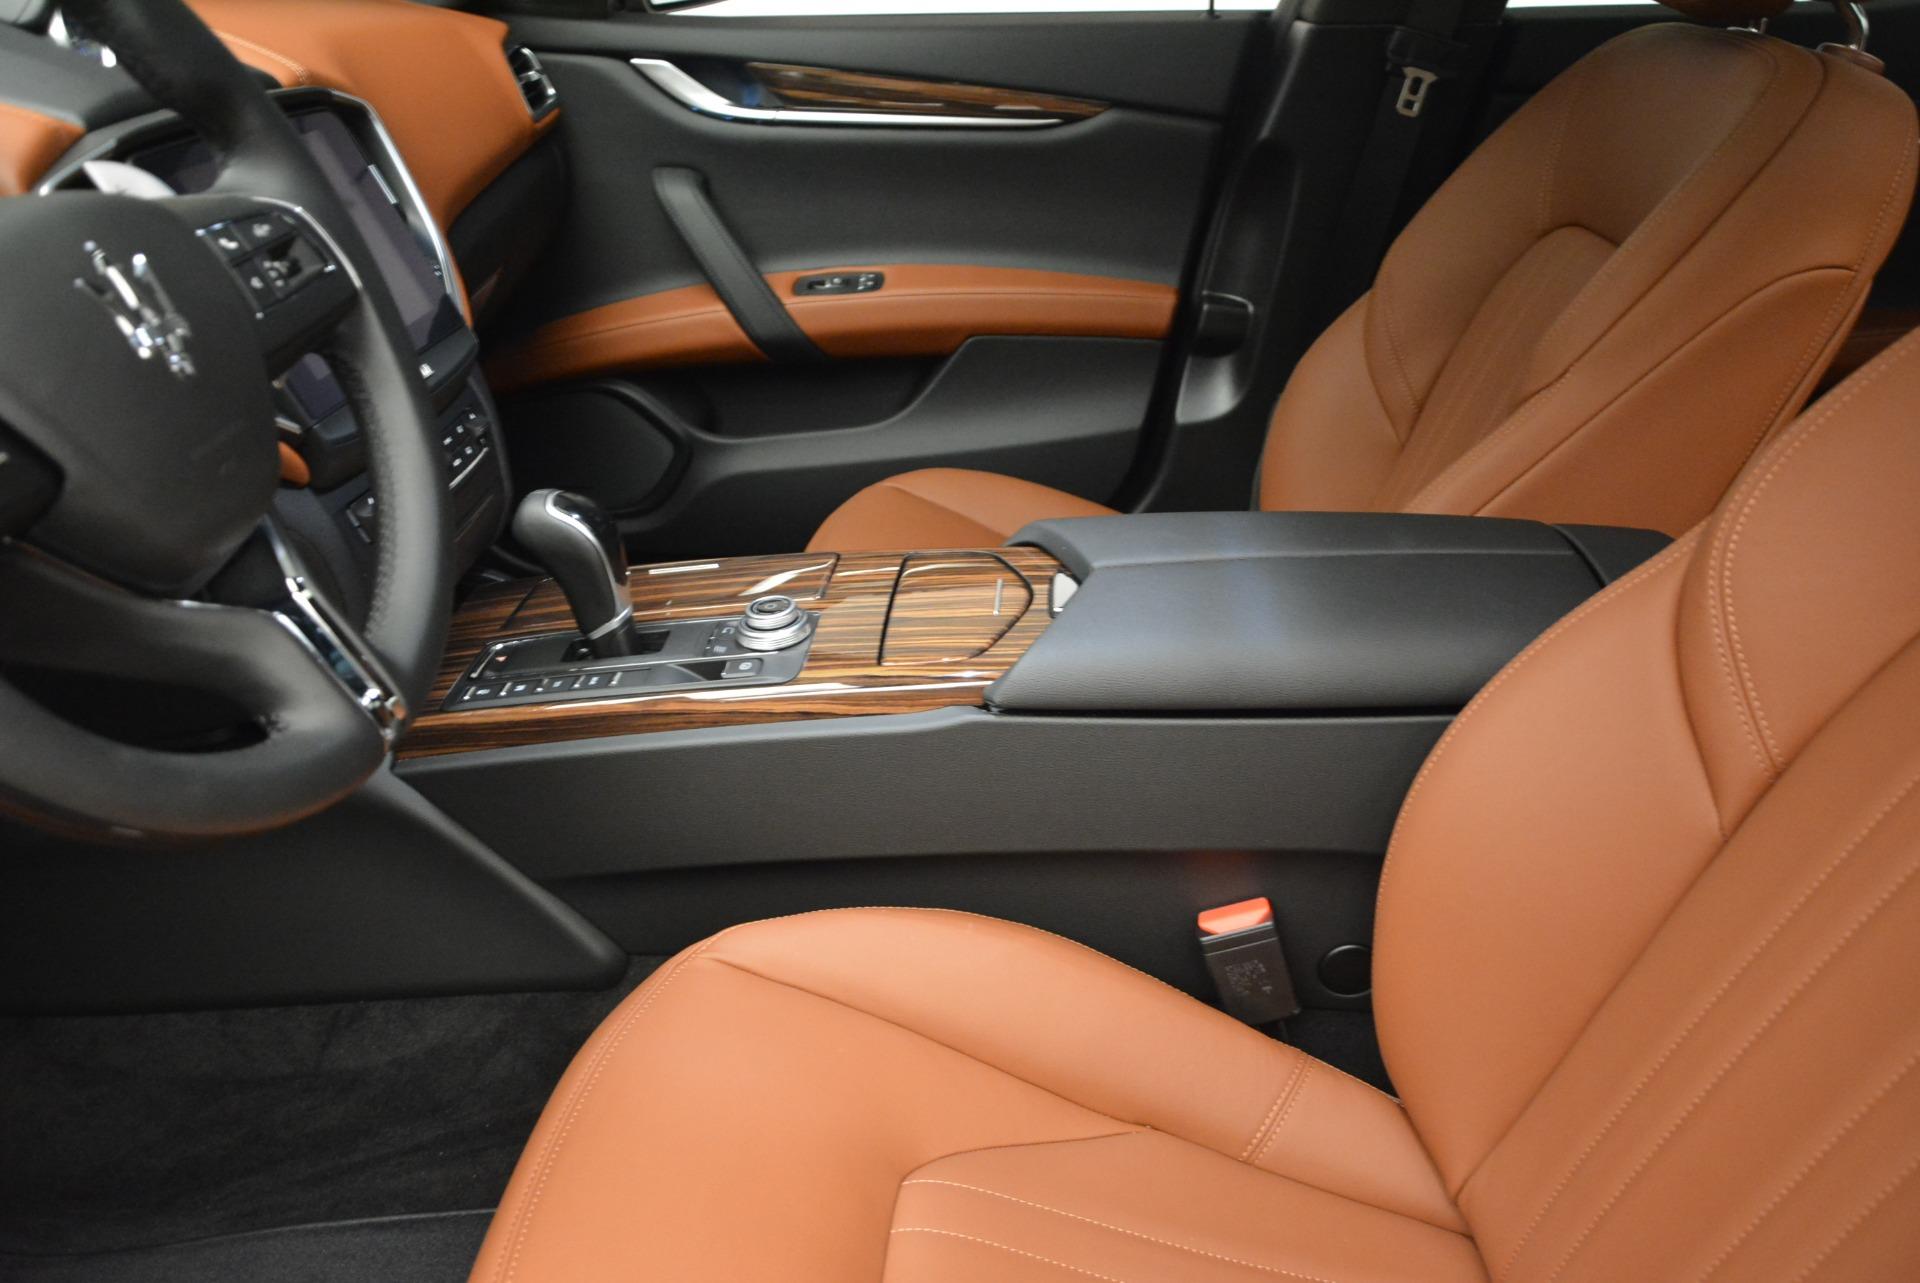 Used 2018 Maserati Ghibli S Q4 For Sale In Westport, CT 1566_p13